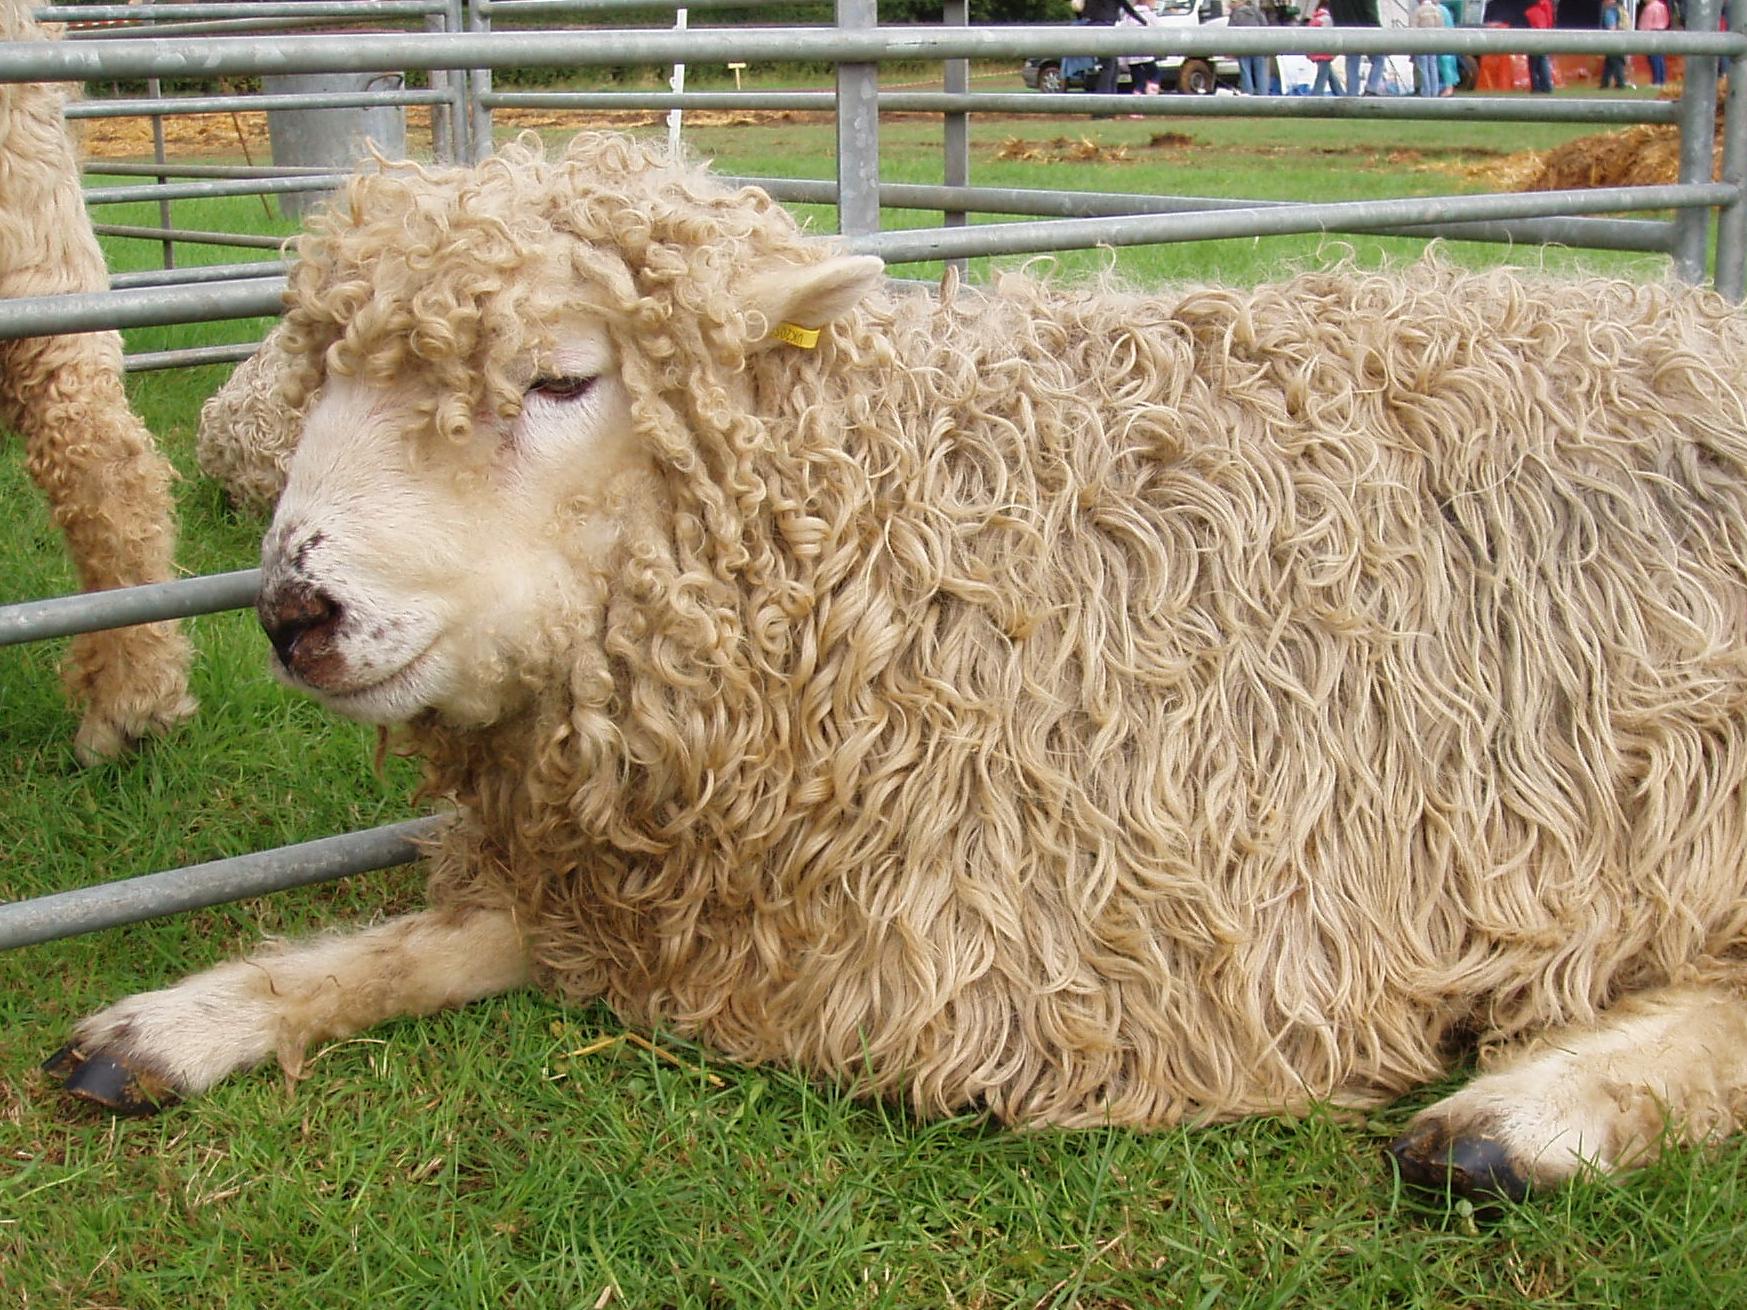 File:Grey Faced Dartmoor sheep.jpg - Wikimedia Commons